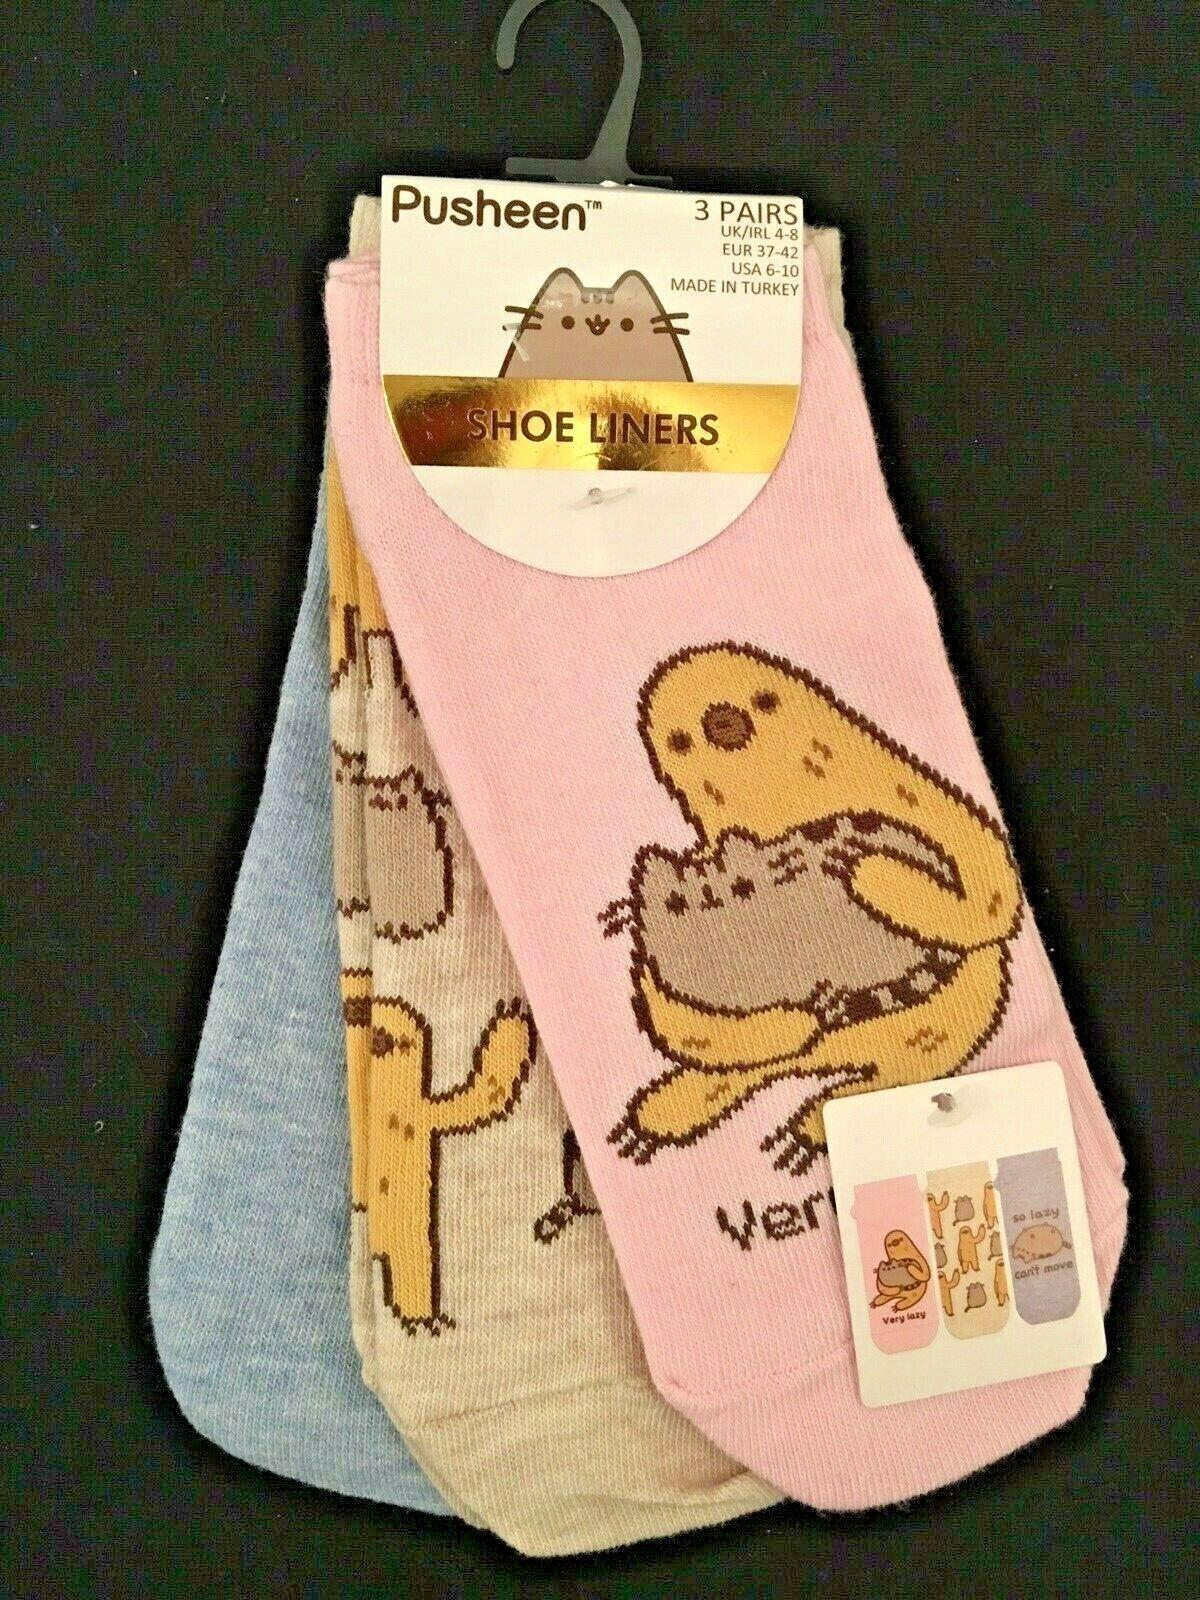 3 Paar Pusheen Katze Cat Faultier Socken Shoe Liners Sneaker socks  knöchel